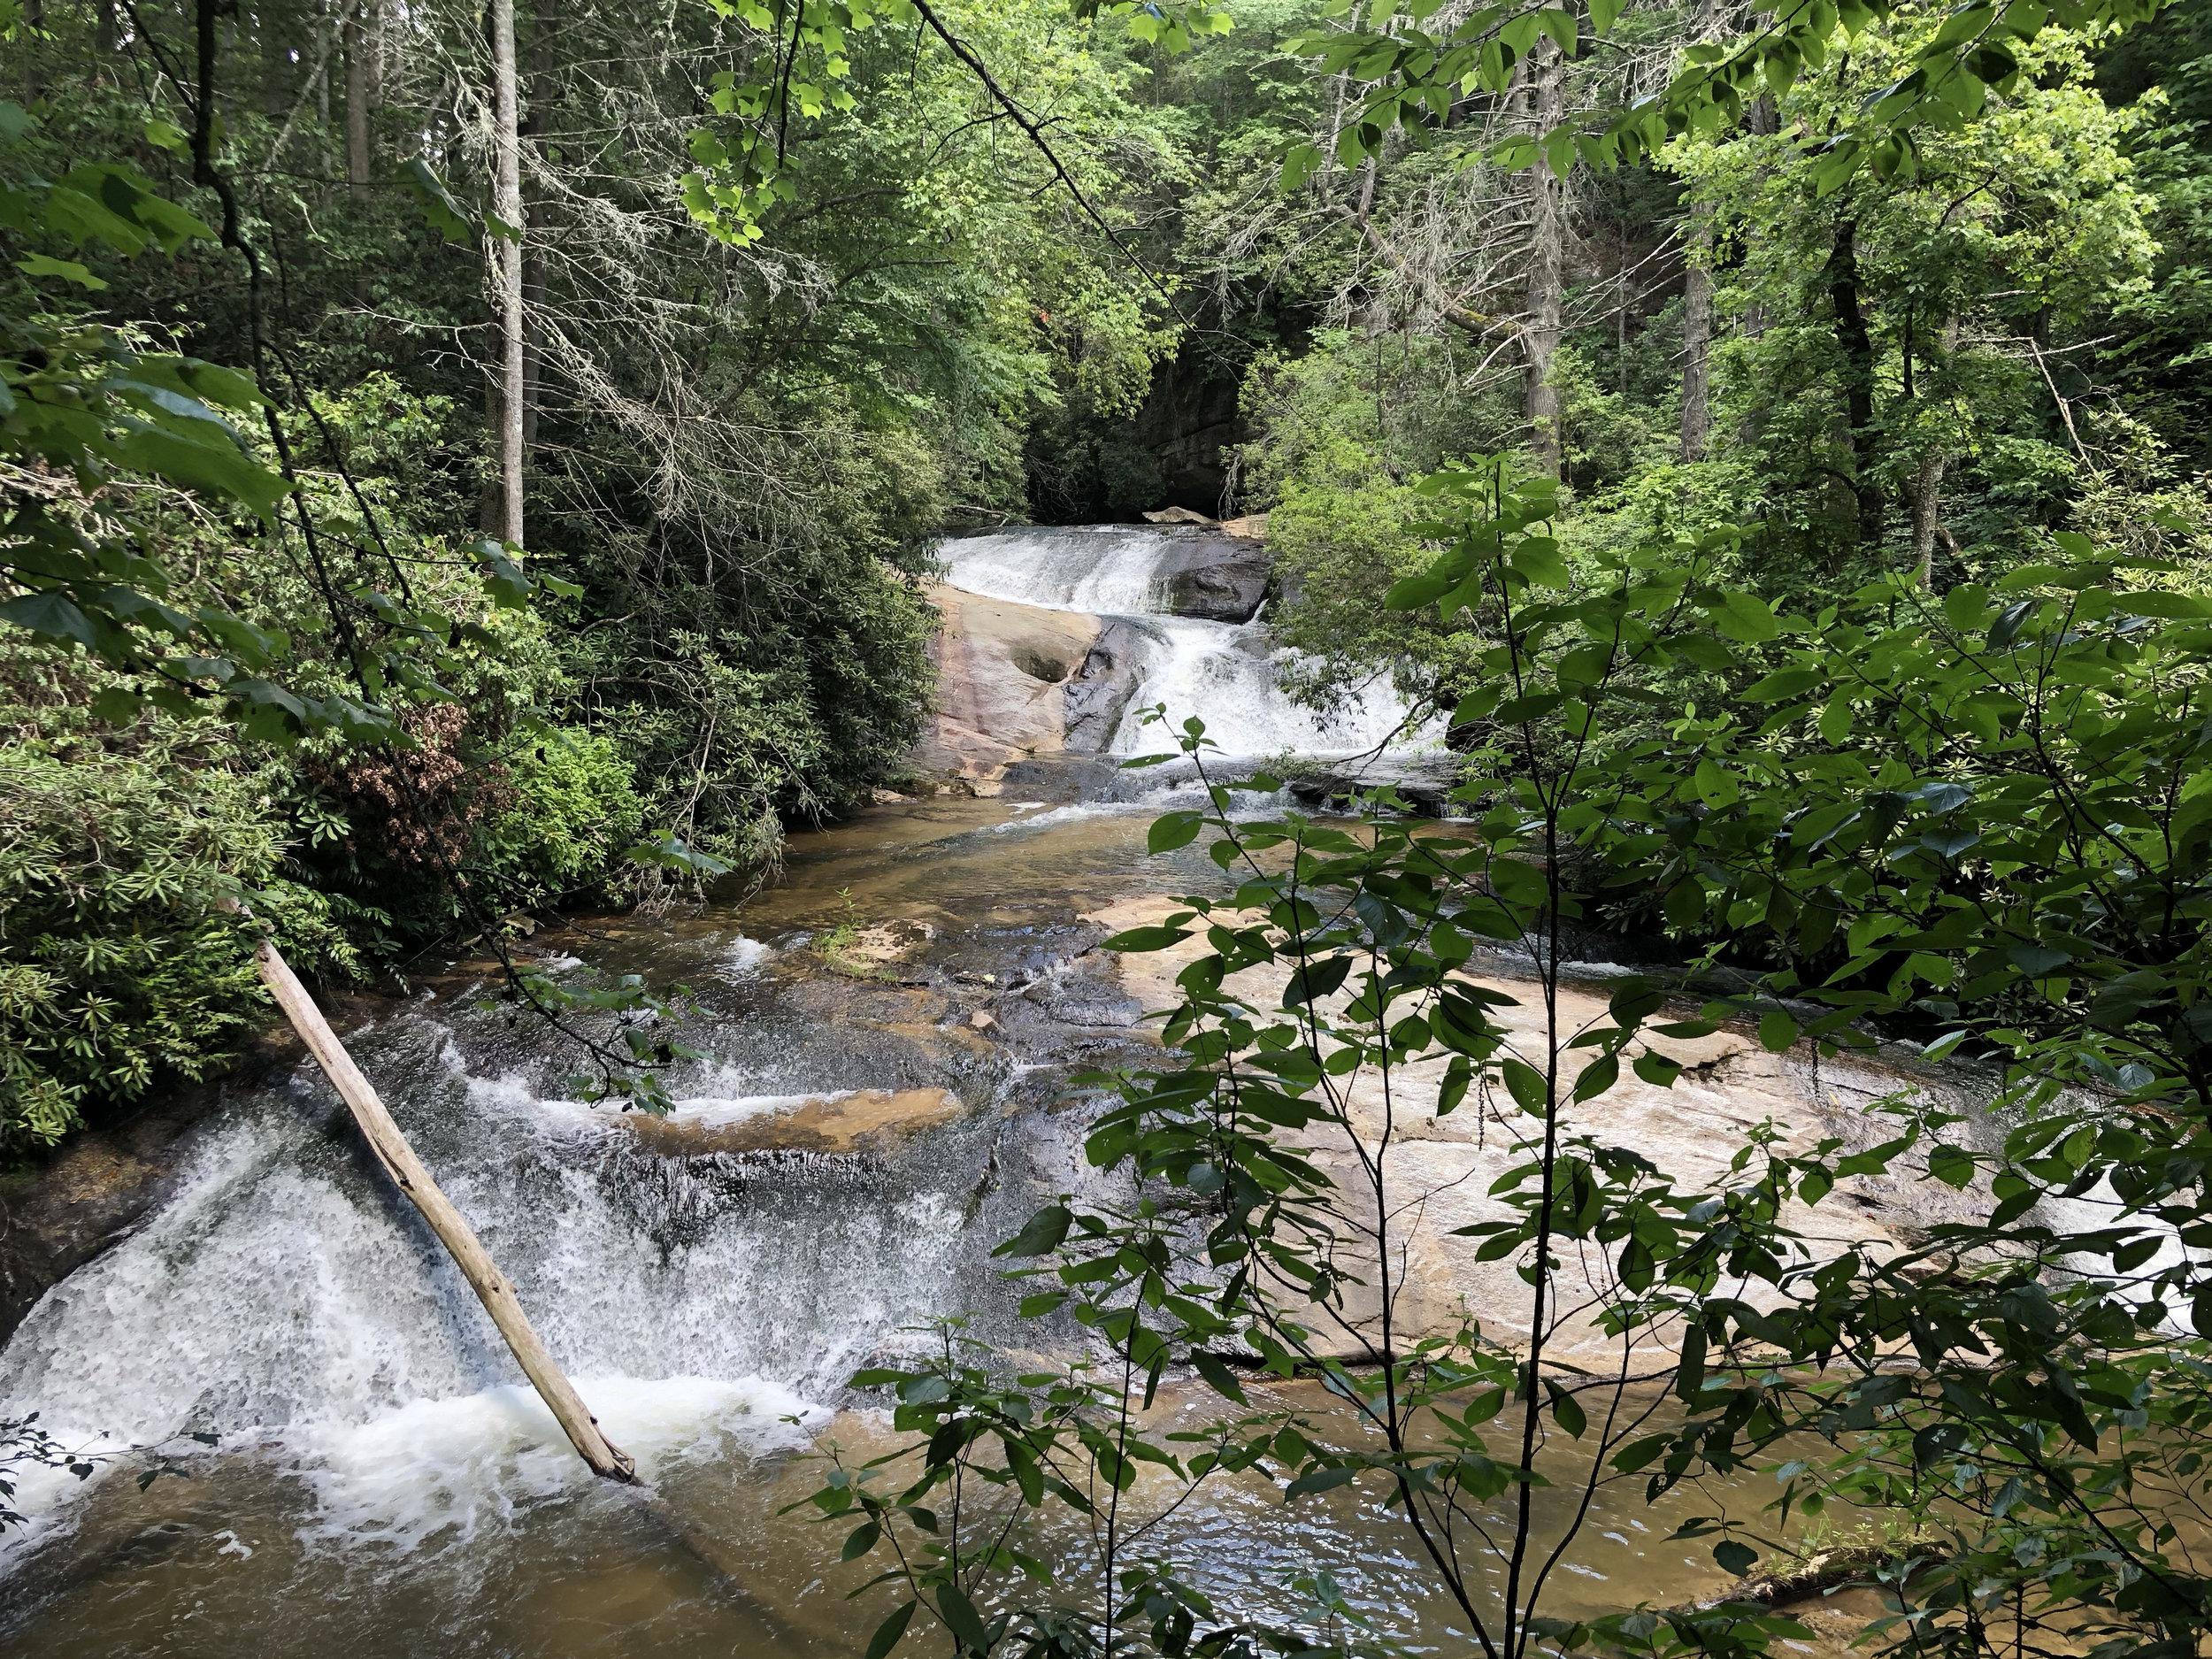 wanderlust-travel-blog-wellness-retreat-north-carolina-mountains